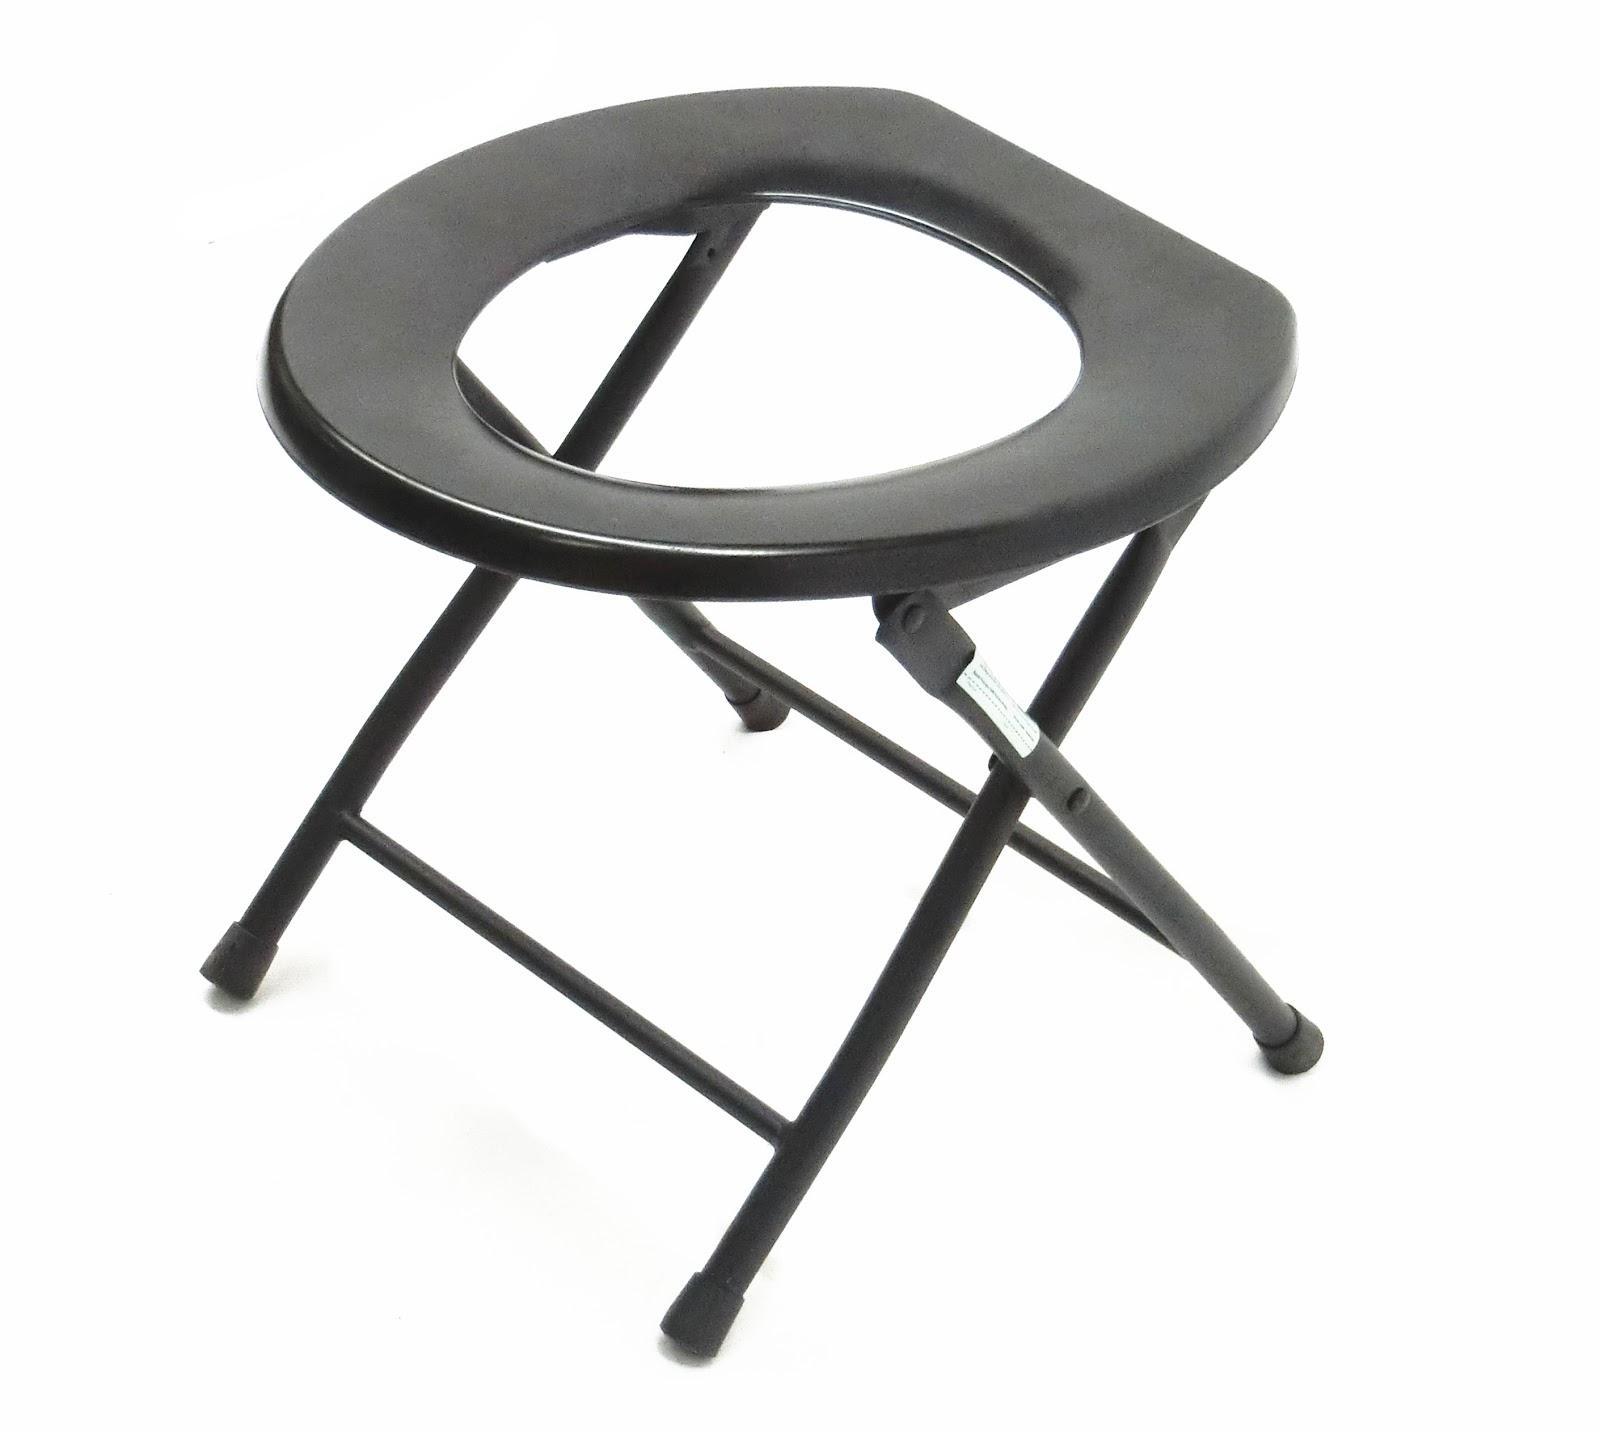 shower chair malaysia elegant dining chairs penang kerusi tandas commode toilet aid